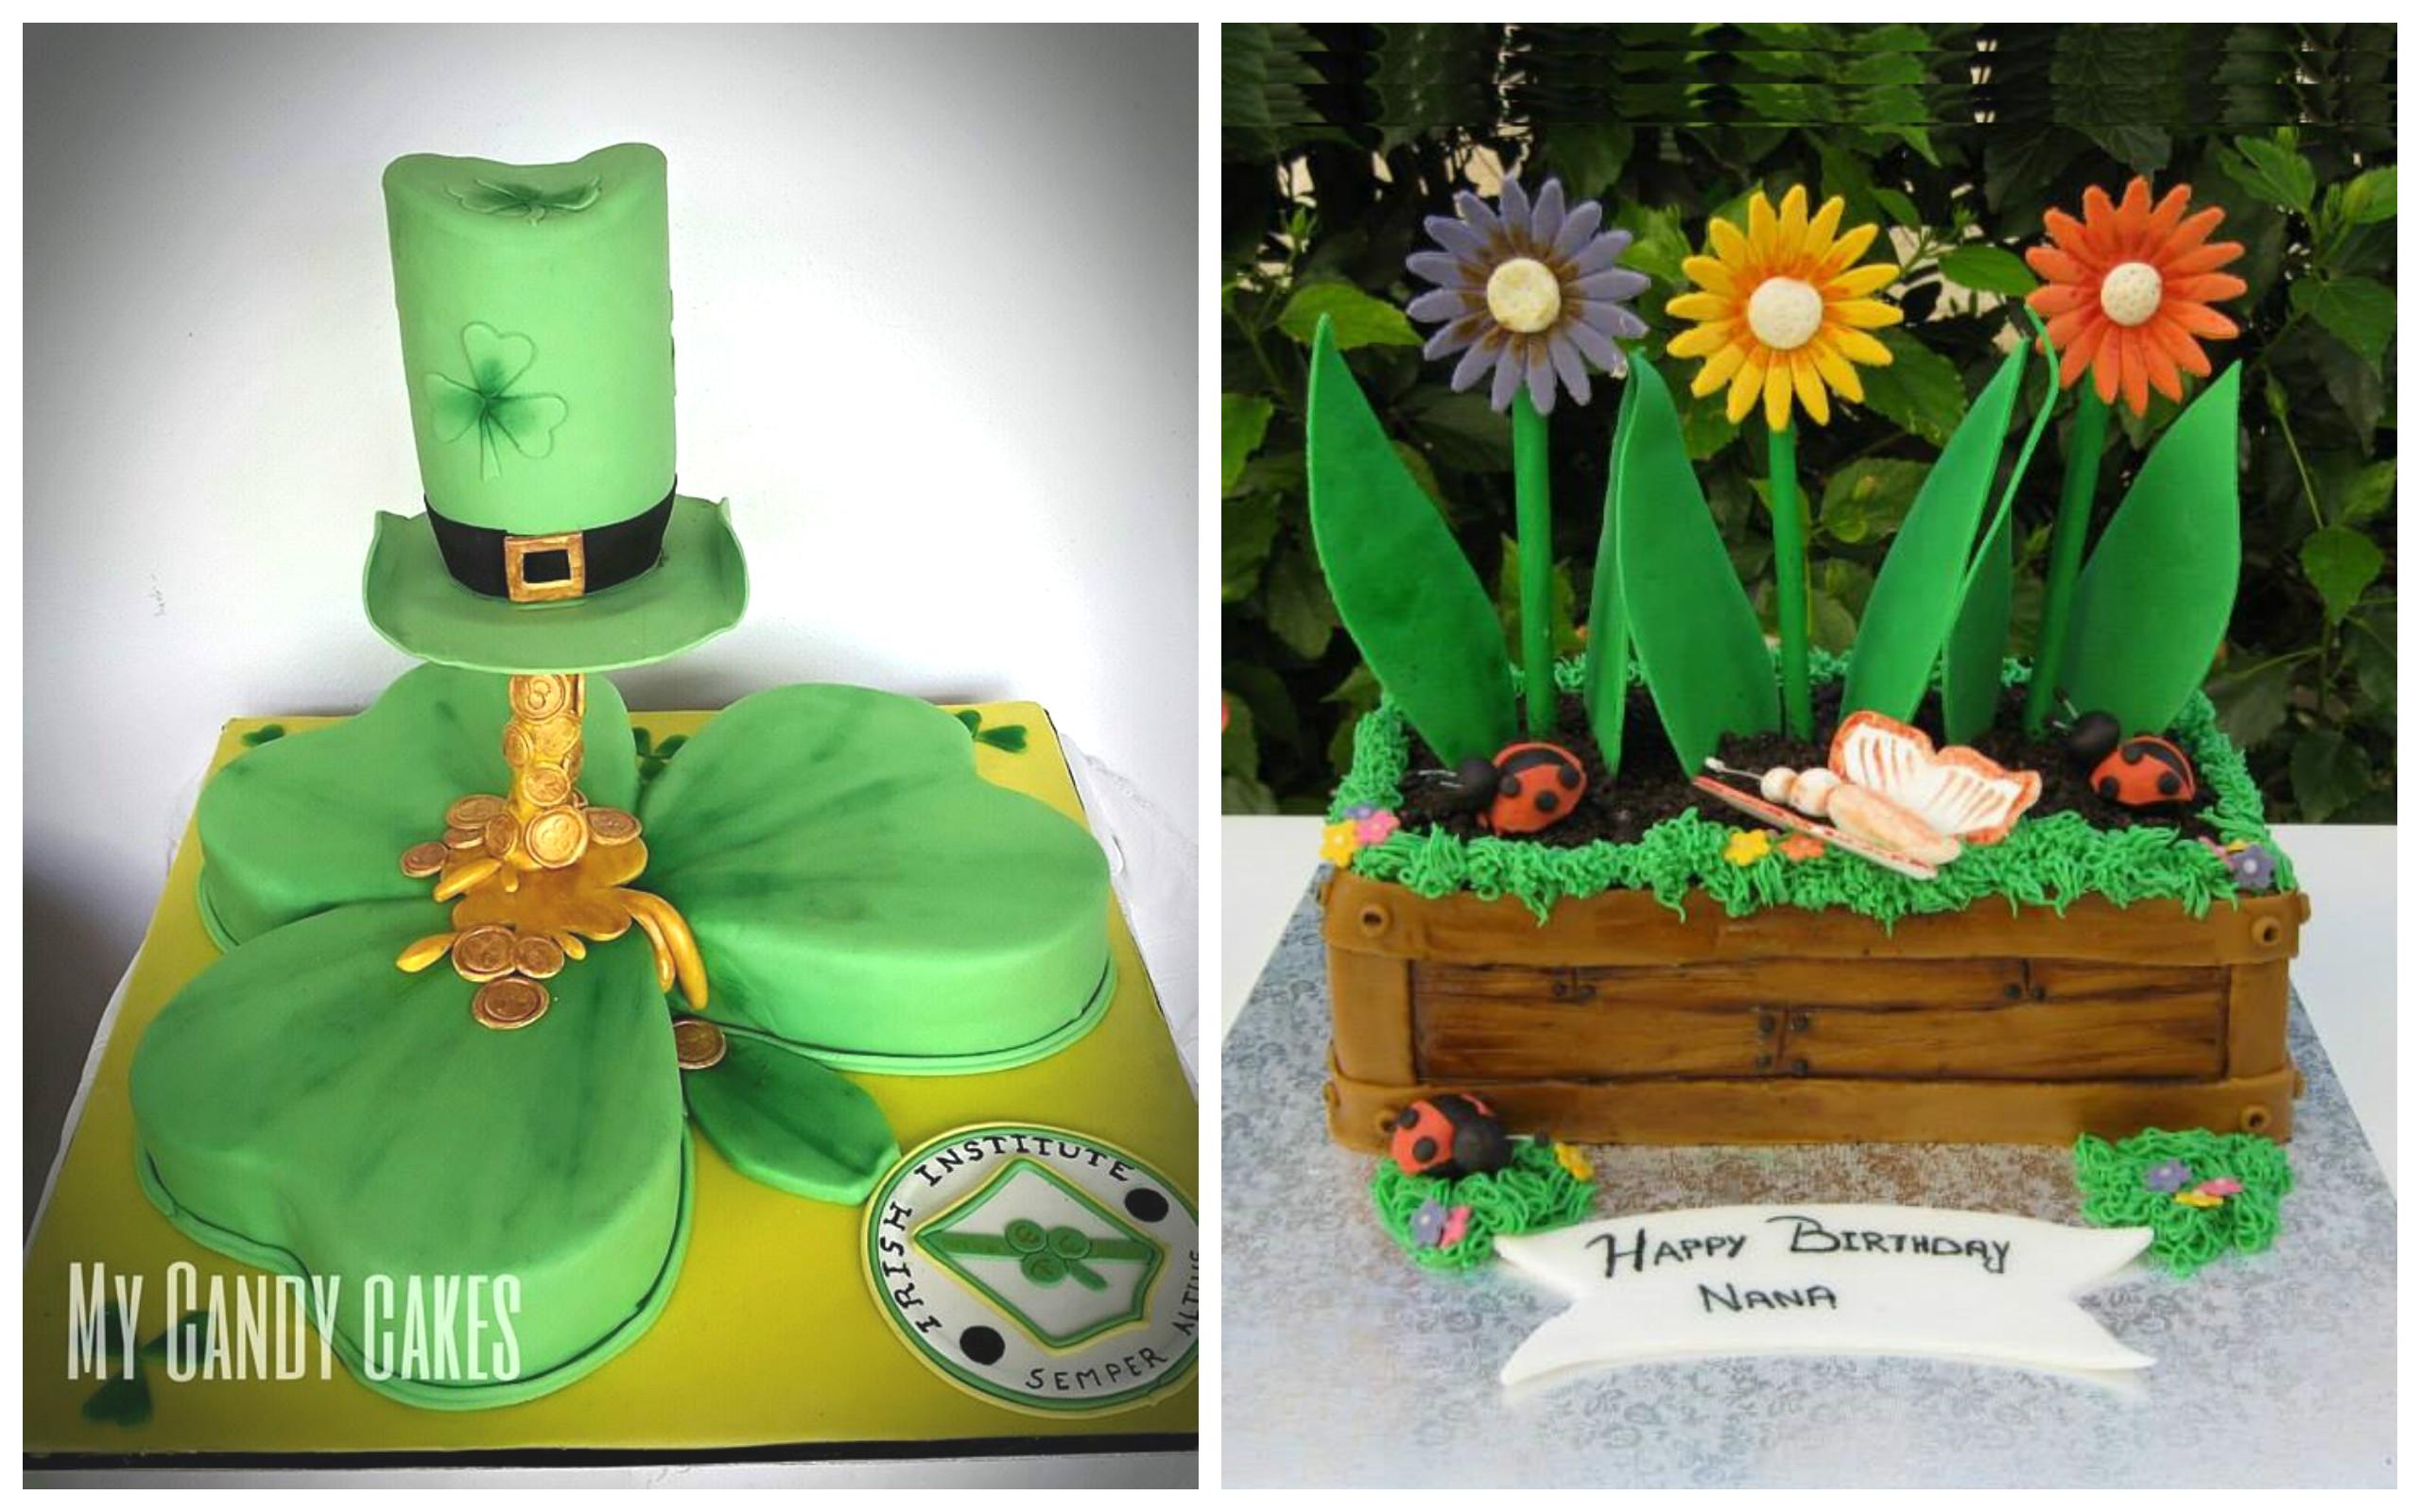 Cake Design Competition 2018 : Competition: 2016 s Super Amazing Cake Designer - Page 13 ...